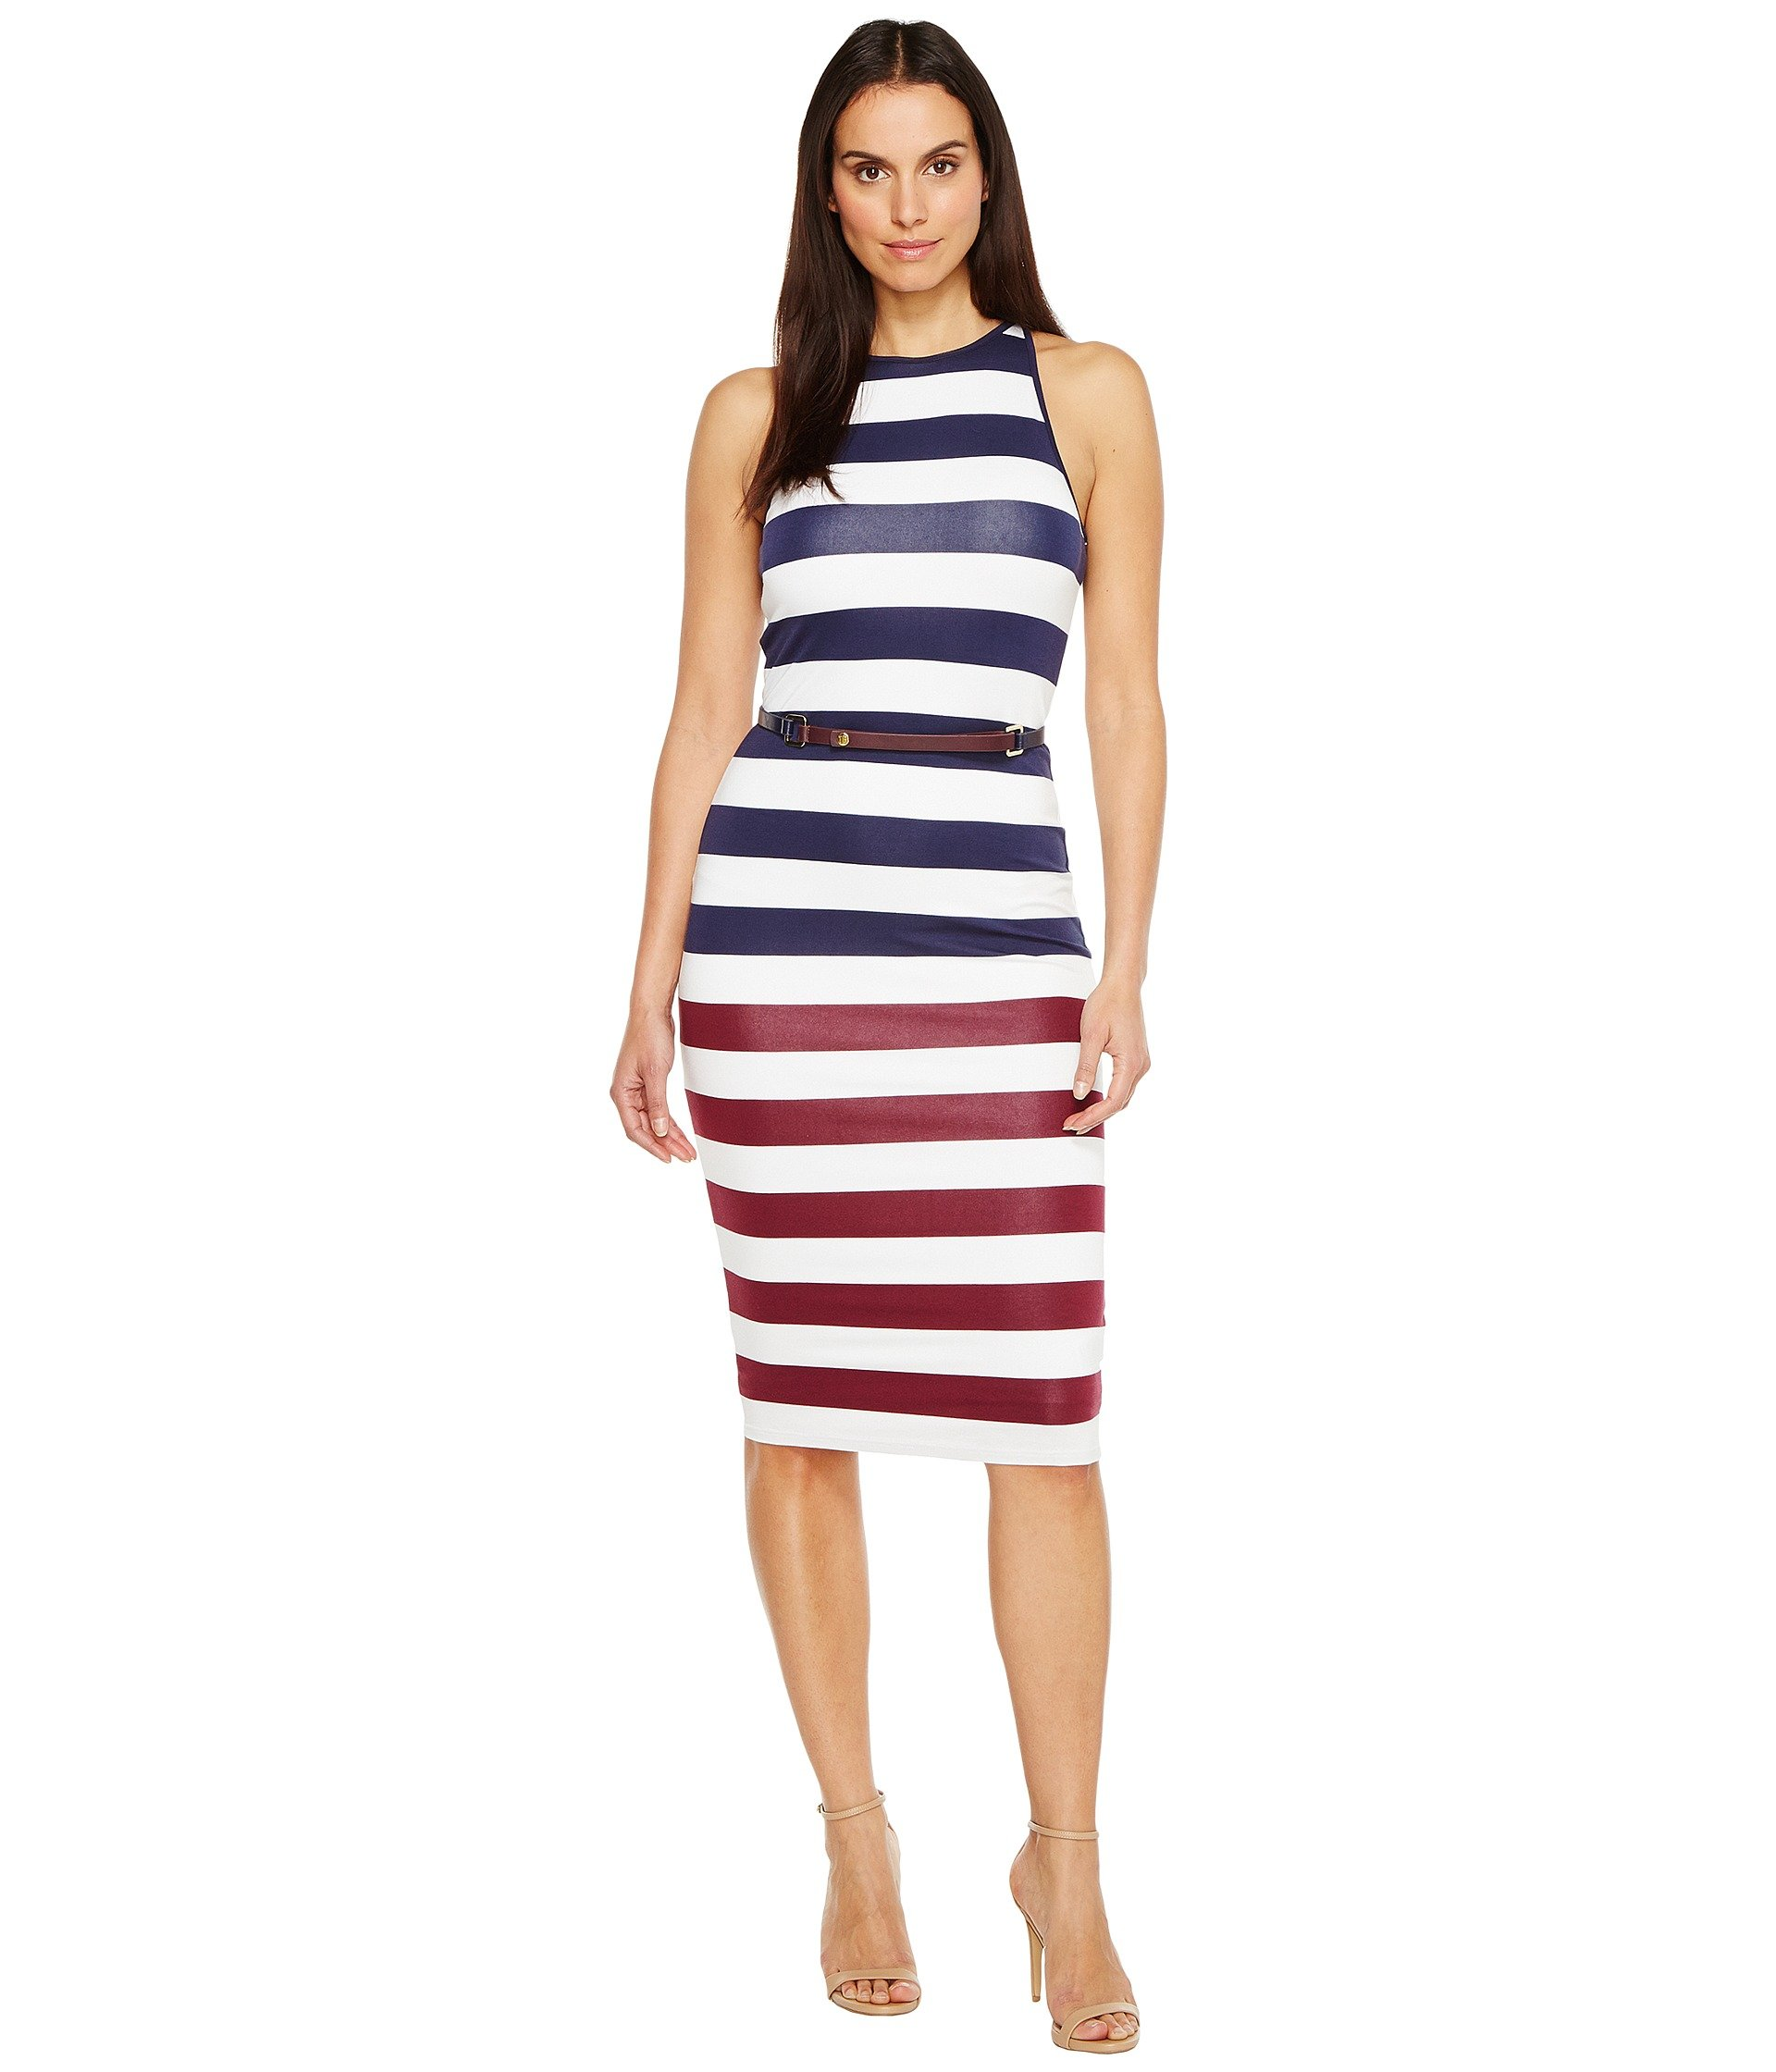 Ted Baker Dresses Yuni Rowing Stripe Bodycon Dress